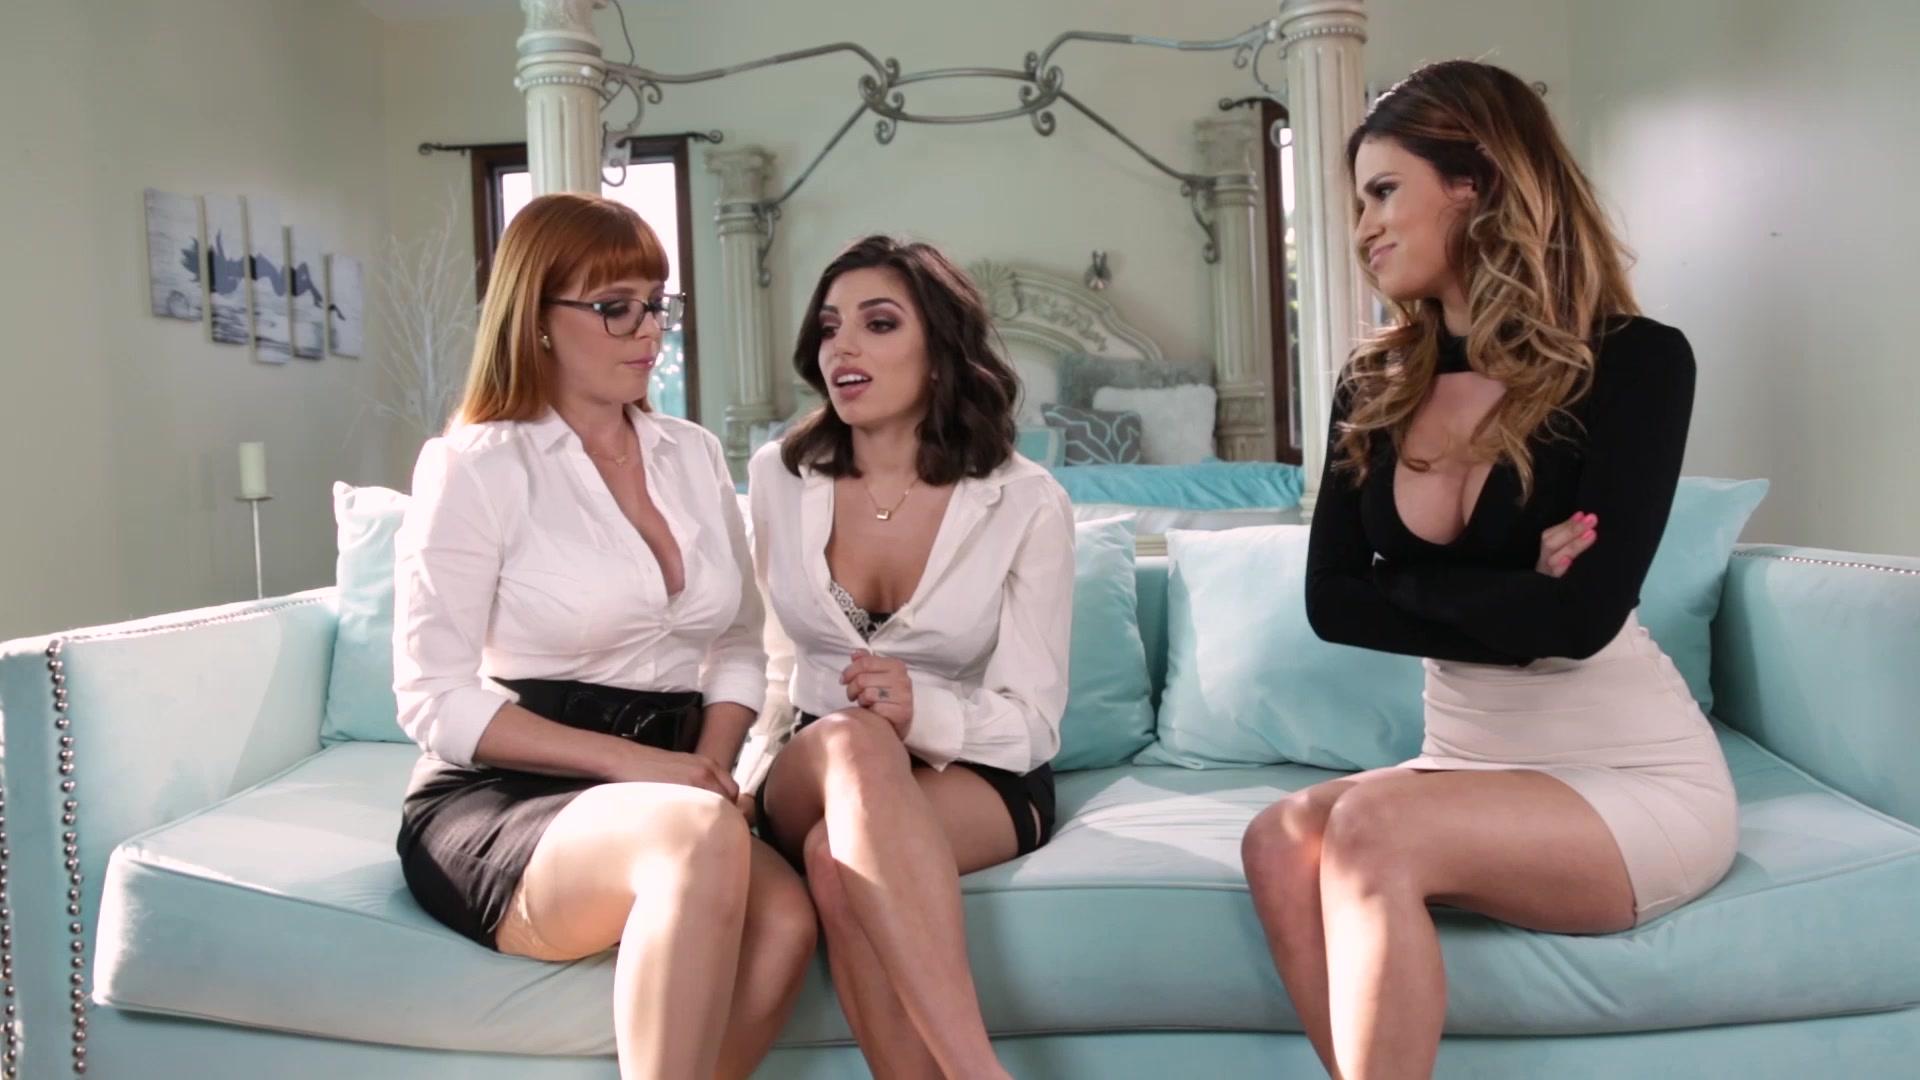 Lesbian Porn Movie Trailers